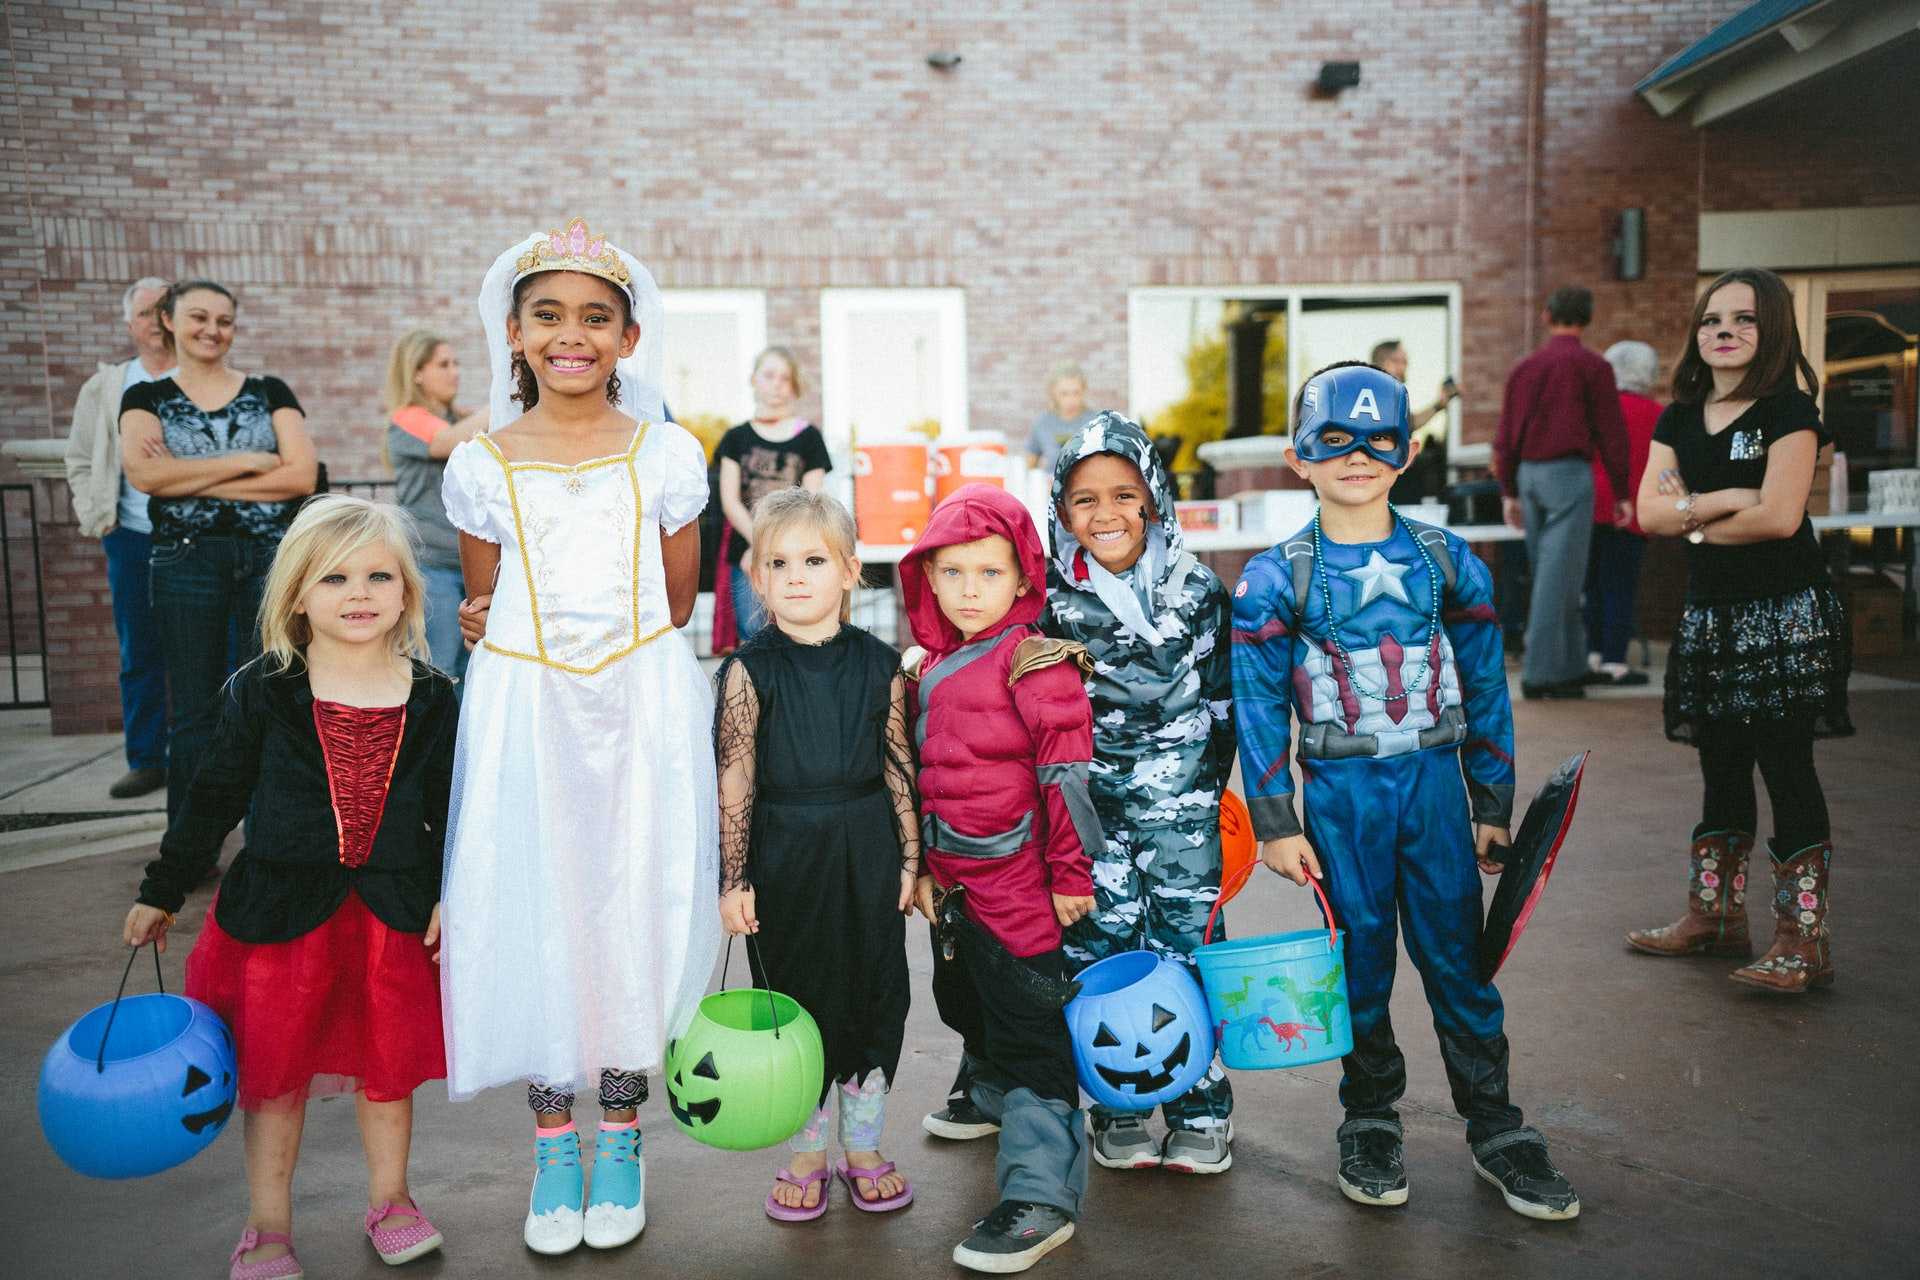 conner baker 7FC 84Ap IU unsplash - 17 Baby Costume Ideas For Halloween in 2021